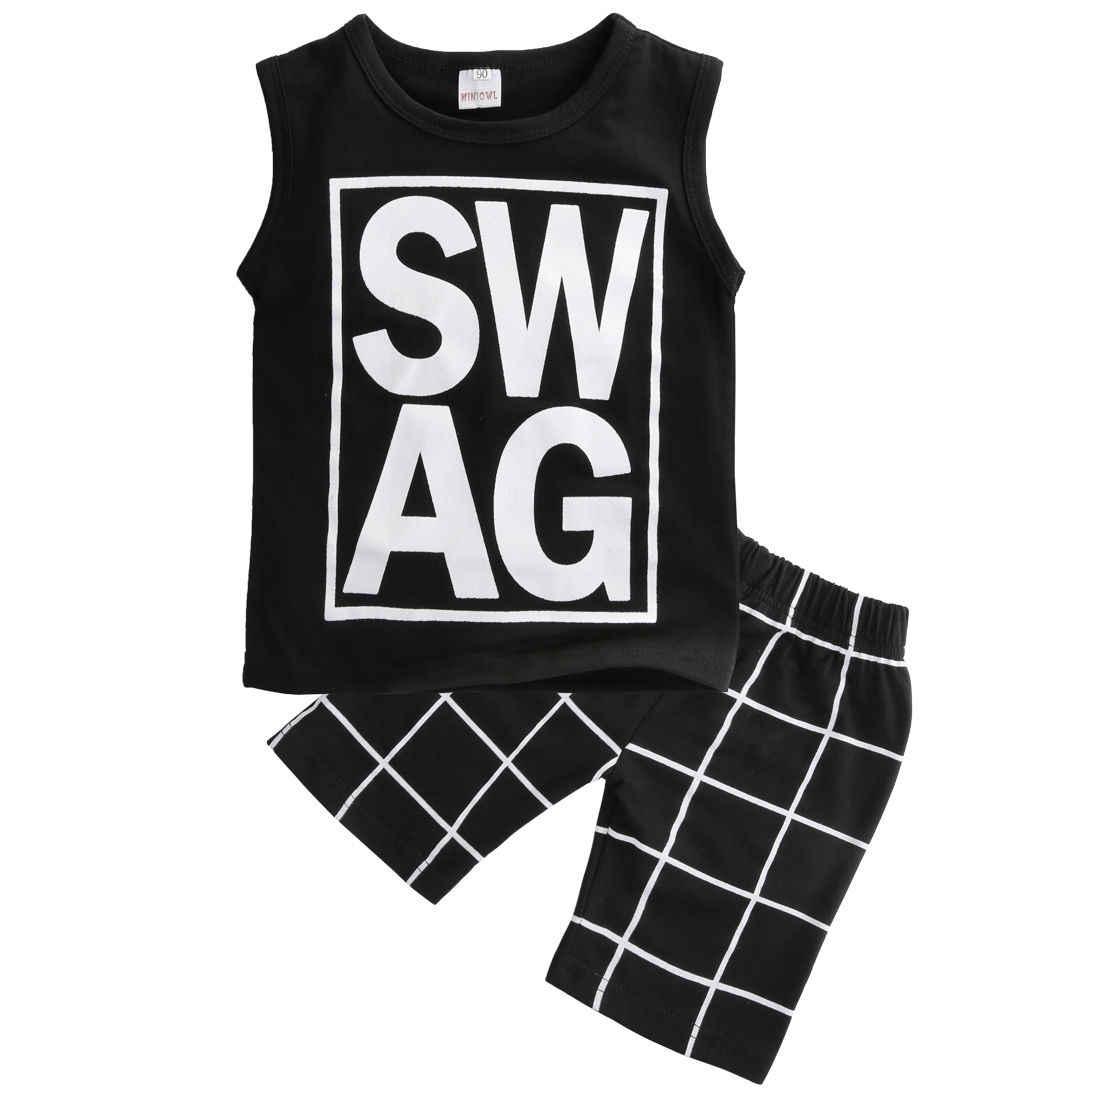 dbd49d70 2pcs Toddler Kids Baby Boy T-shirt Tops+Casual Pants Trouser Clothe Outfit  Set